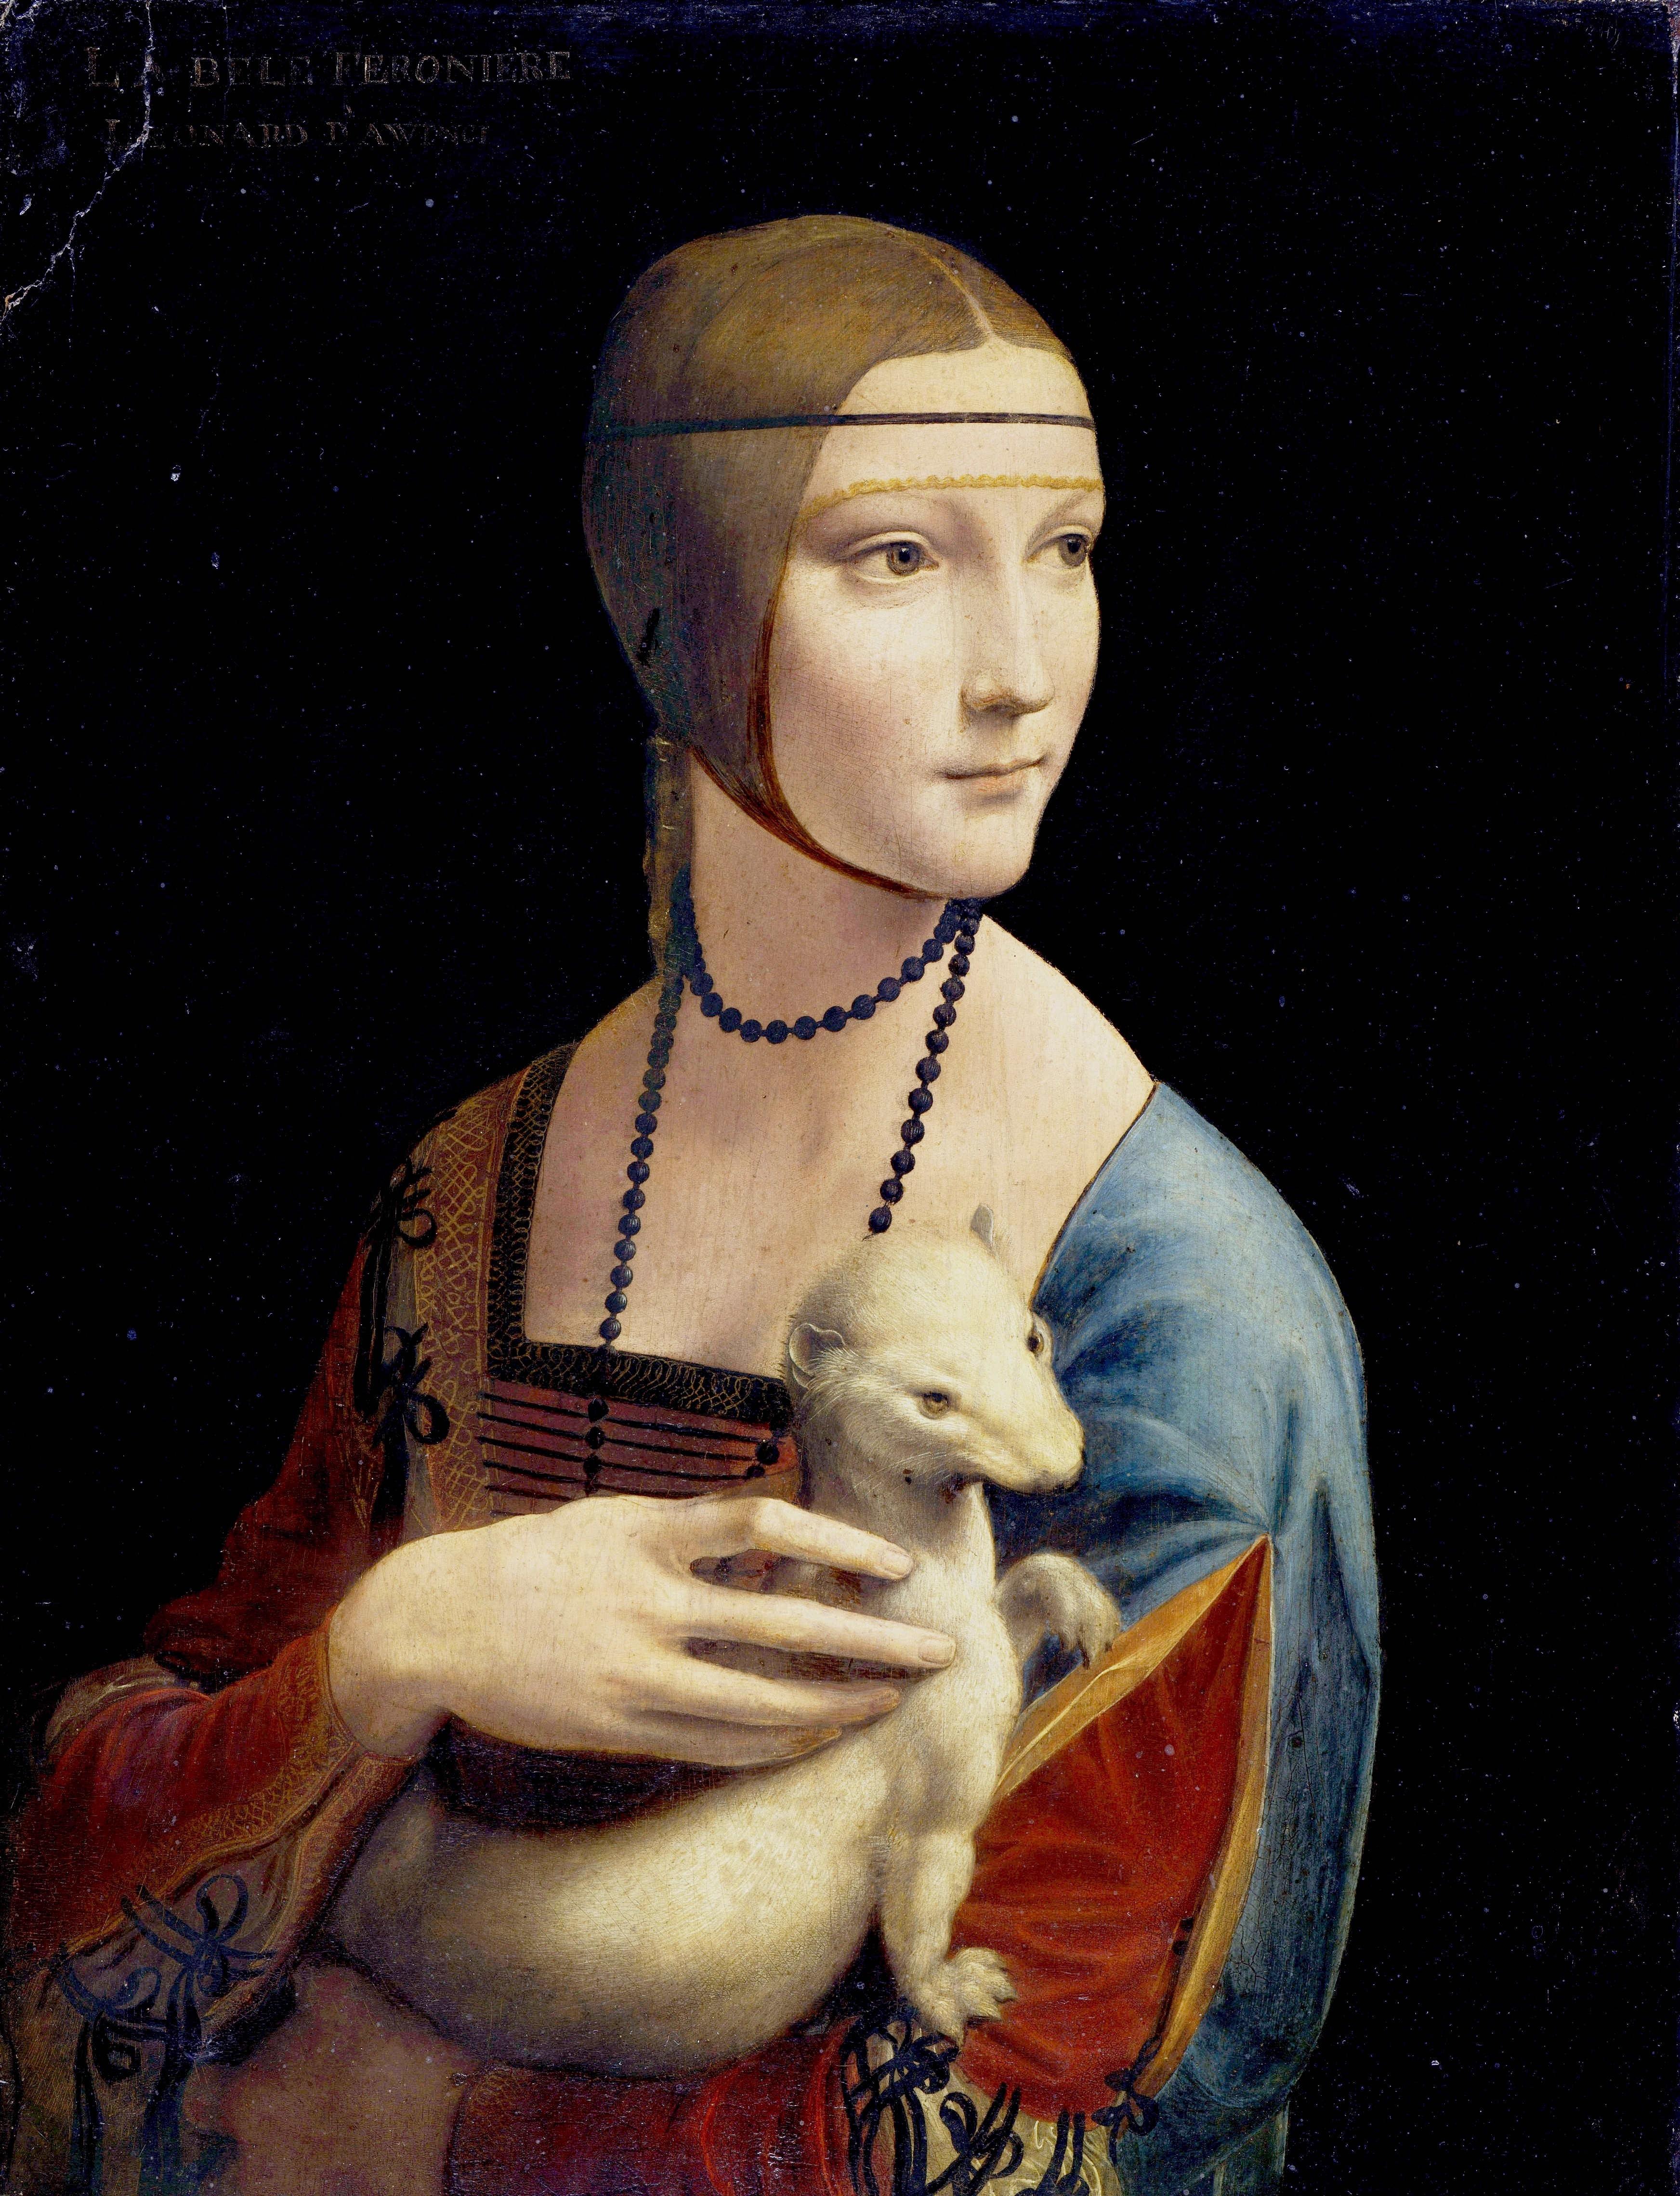 Leonardo da Vinci, Dame mit dem Hermelin, 1489/1490, Öl und Tempera auf Holz, 54,7 x 40,3 cm (Czartoryski-Museum, Krakau)